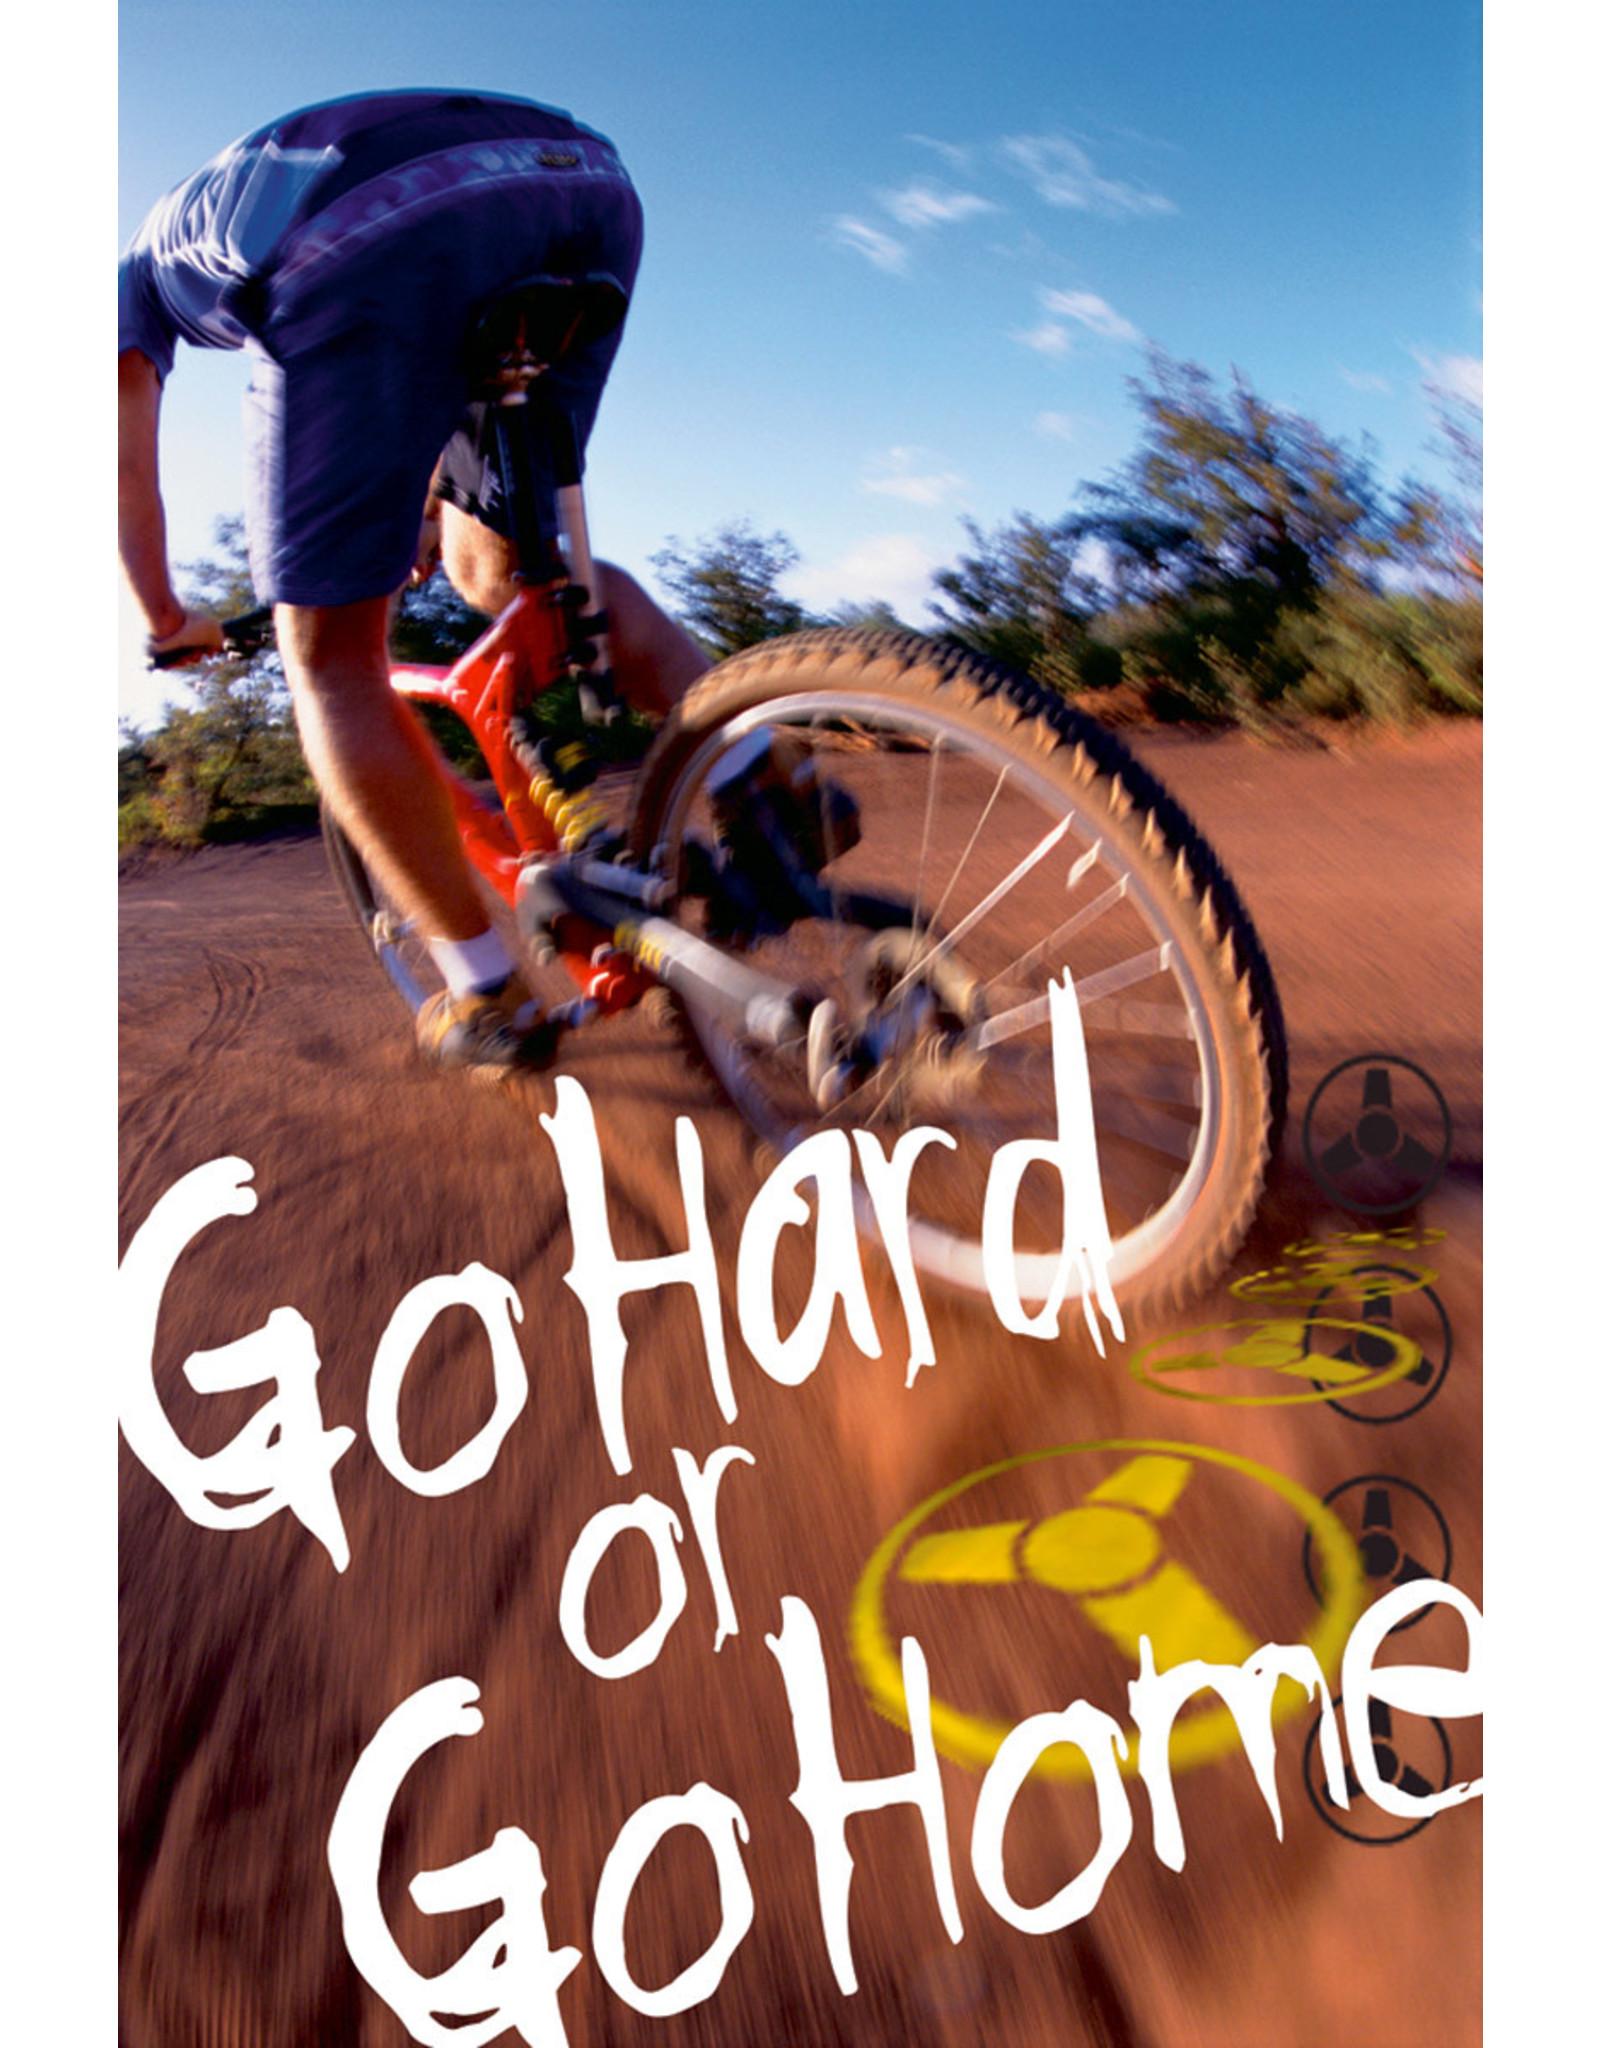 Eurographics Bike Hard or Go Home - Poster